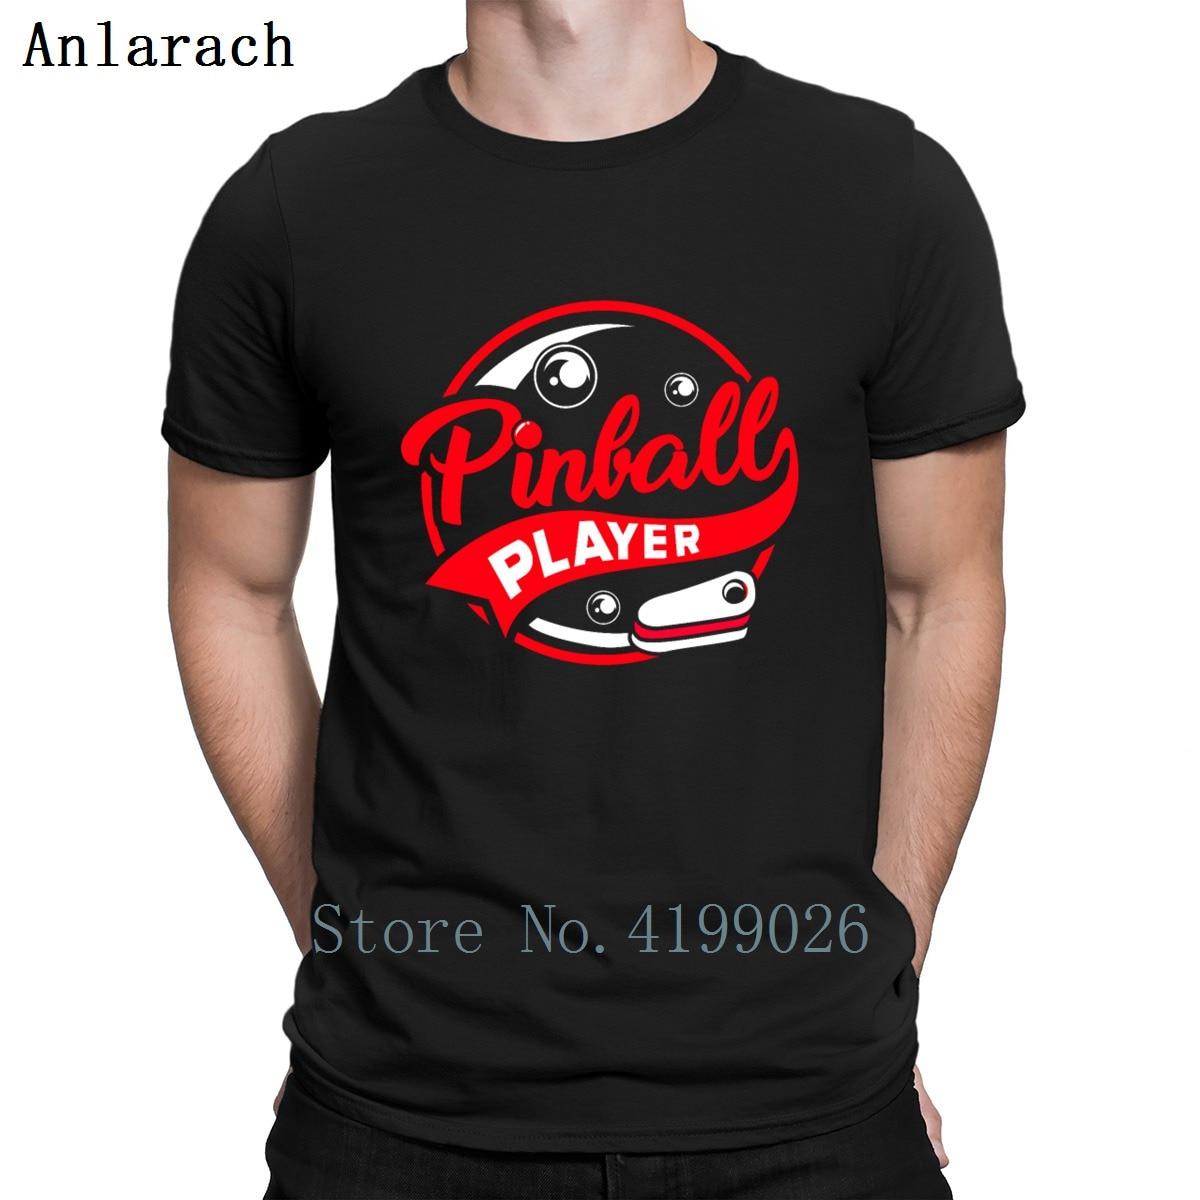 Pinball Machine Wizard Flipper Arcade Game T Shirt Formal S-XXXXXL Cotton Family Fashion Print Summer Style Sunlight Shirt